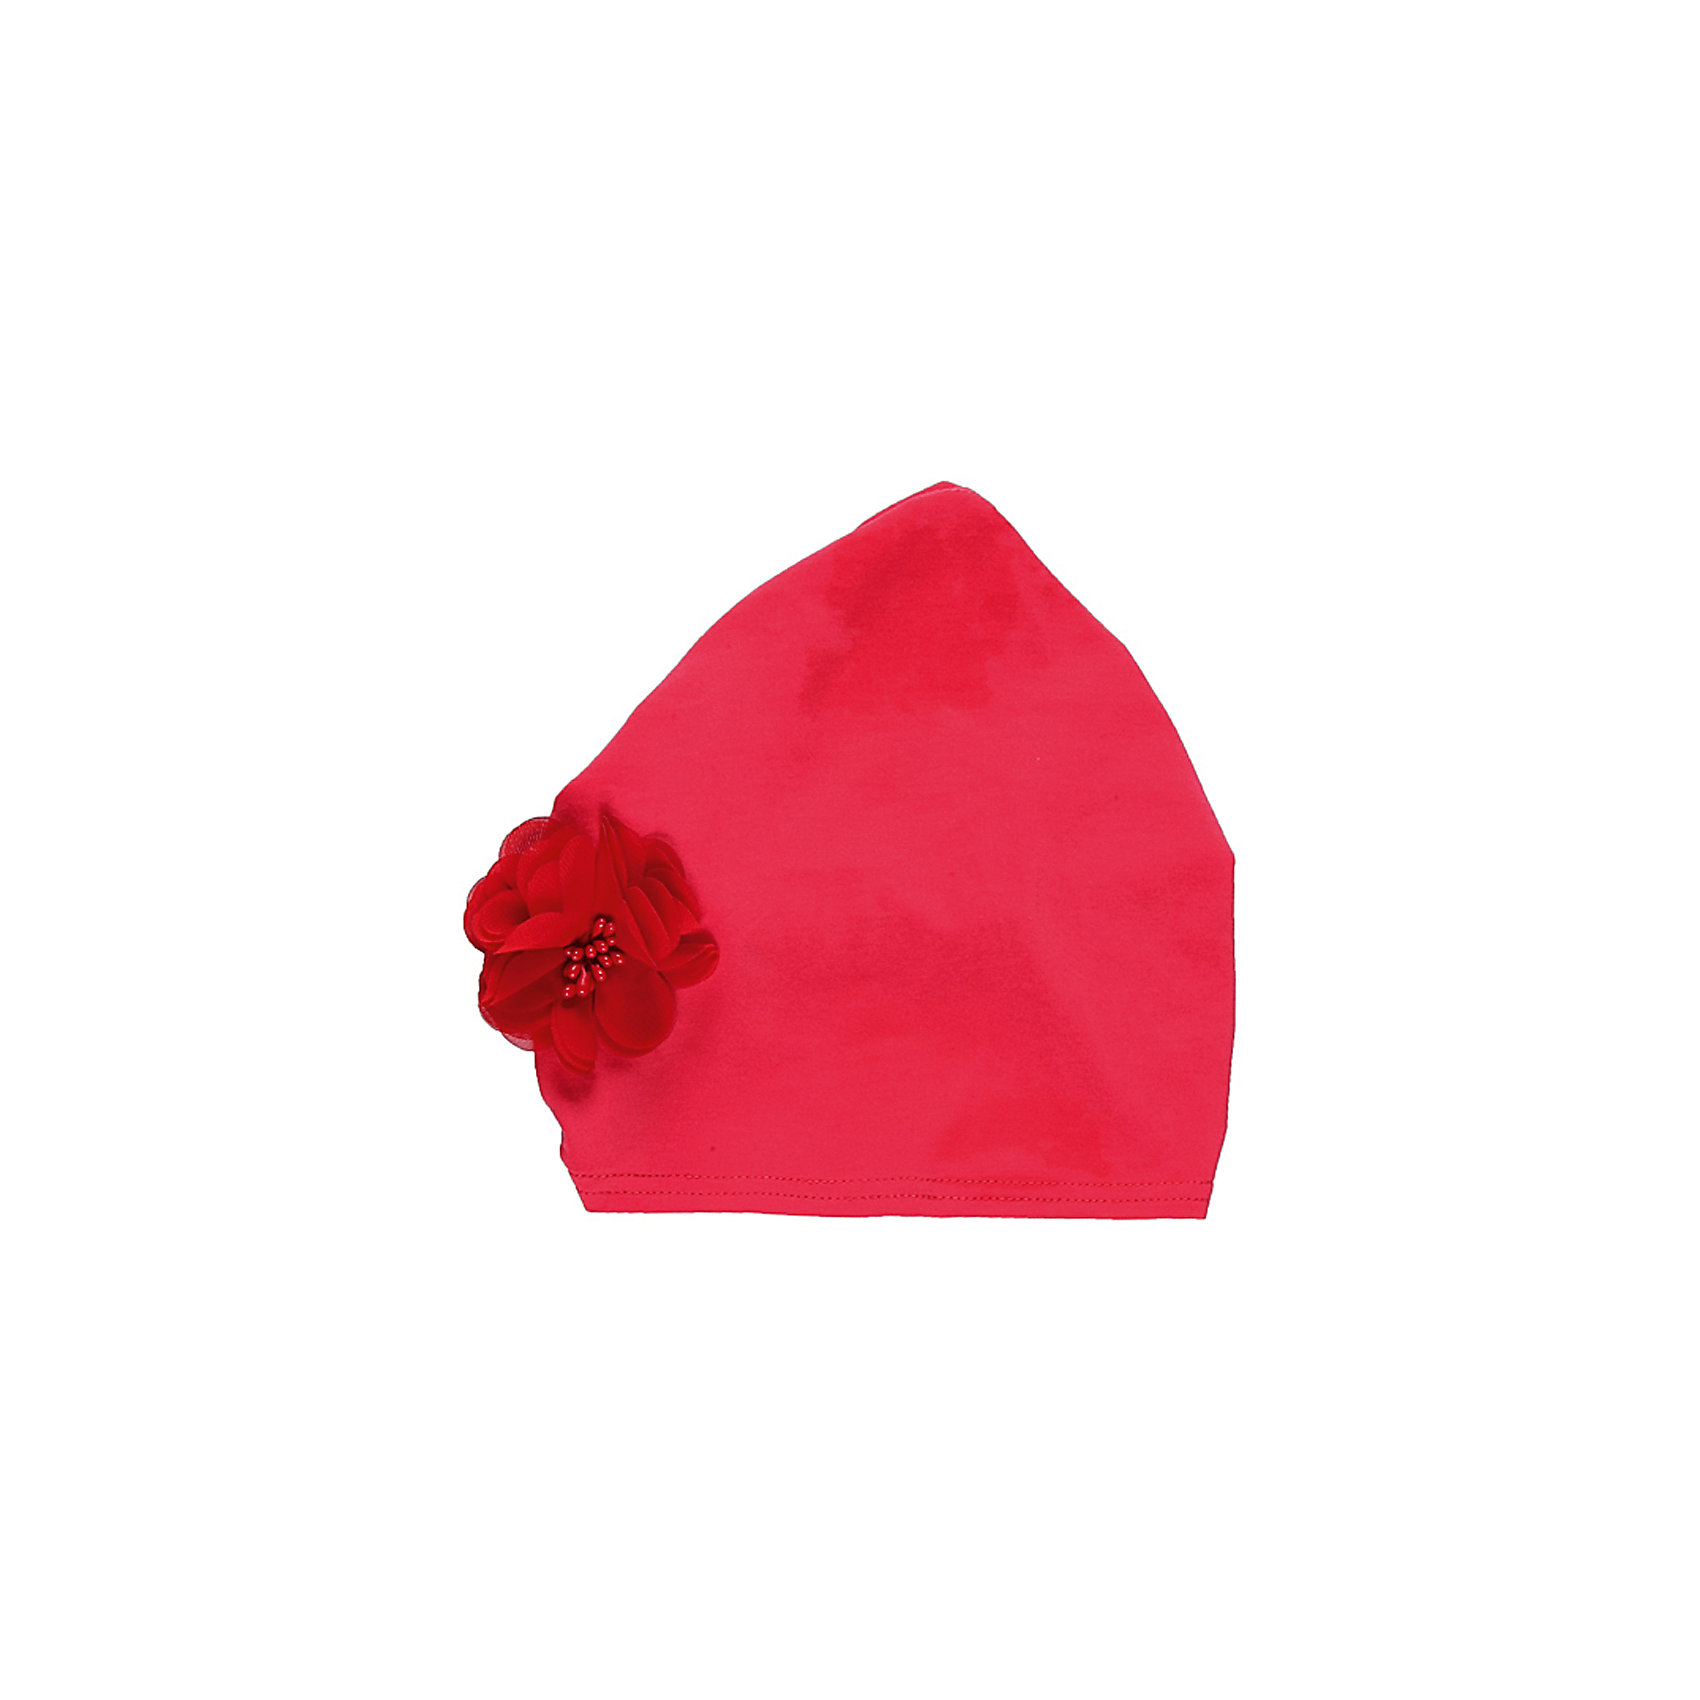 Повязка на голову для девочки Sweet BerryКосынка на девочку, из тонкого трикотажа, декорирована шифоновым цветком.<br>Состав:<br>100% хлопок<br><br>Ширина мм: 89<br>Глубина мм: 117<br>Высота мм: 44<br>Вес г: 155<br>Цвет: розовый<br>Возраст от месяцев: 48<br>Возраст до месяцев: 60<br>Пол: Женский<br>Возраст: Детский<br>Размер: 52,50,54<br>SKU: 4521286